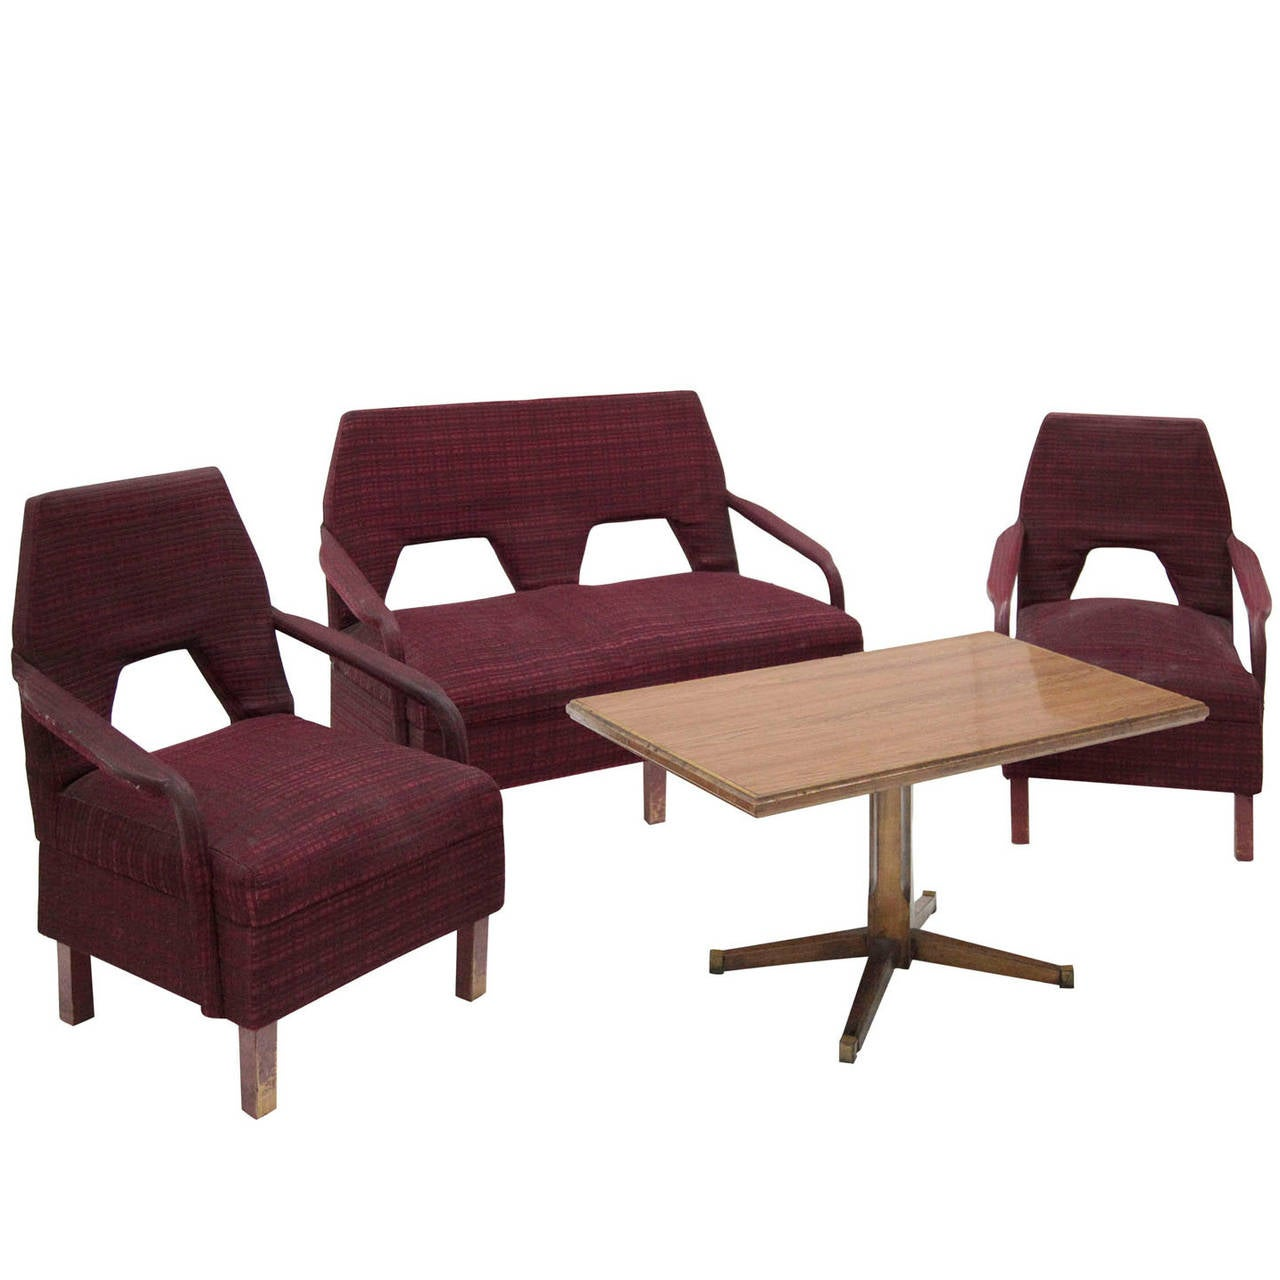 italian living room set at 1stdibs. Black Bedroom Furniture Sets. Home Design Ideas